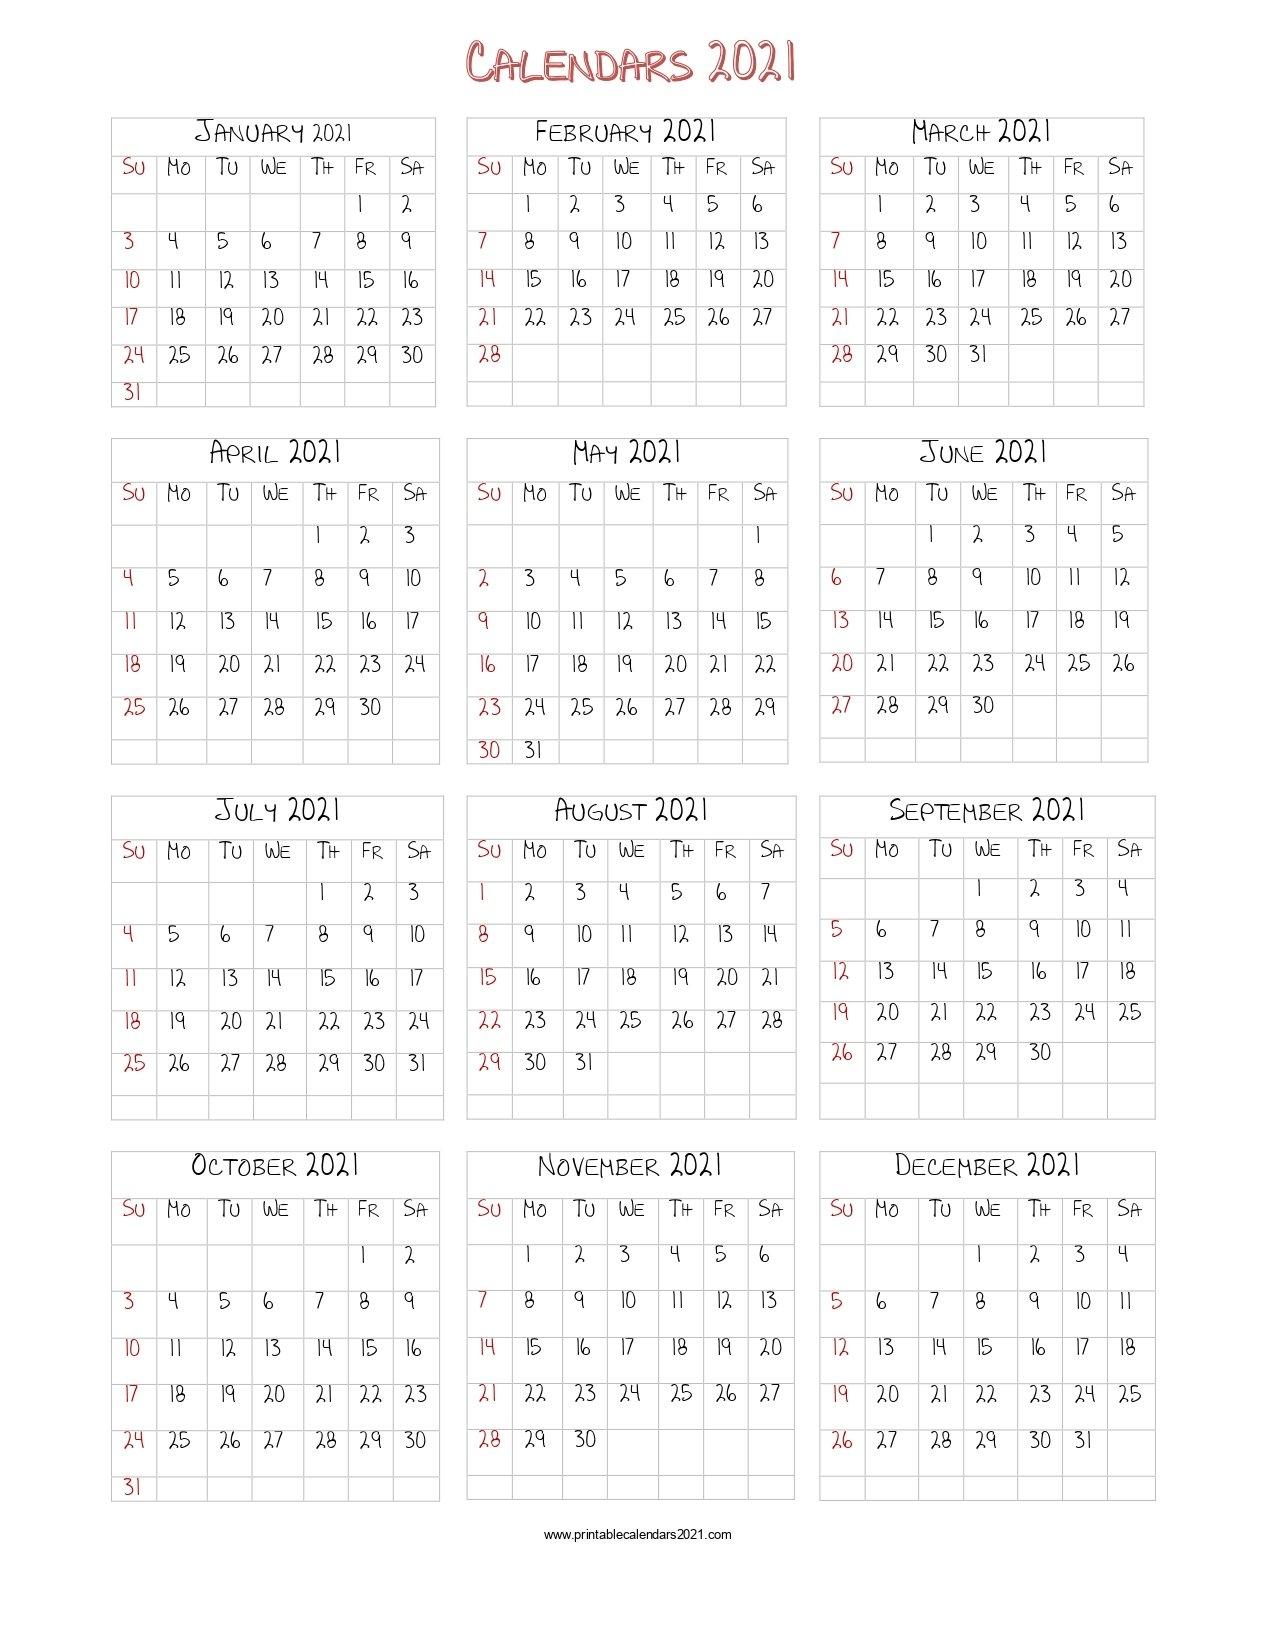 56+ Printable Calendar 2021 One Page, Printable 2021 Yearly Calendar with Calendar 2019 2021 2021 Printable Free